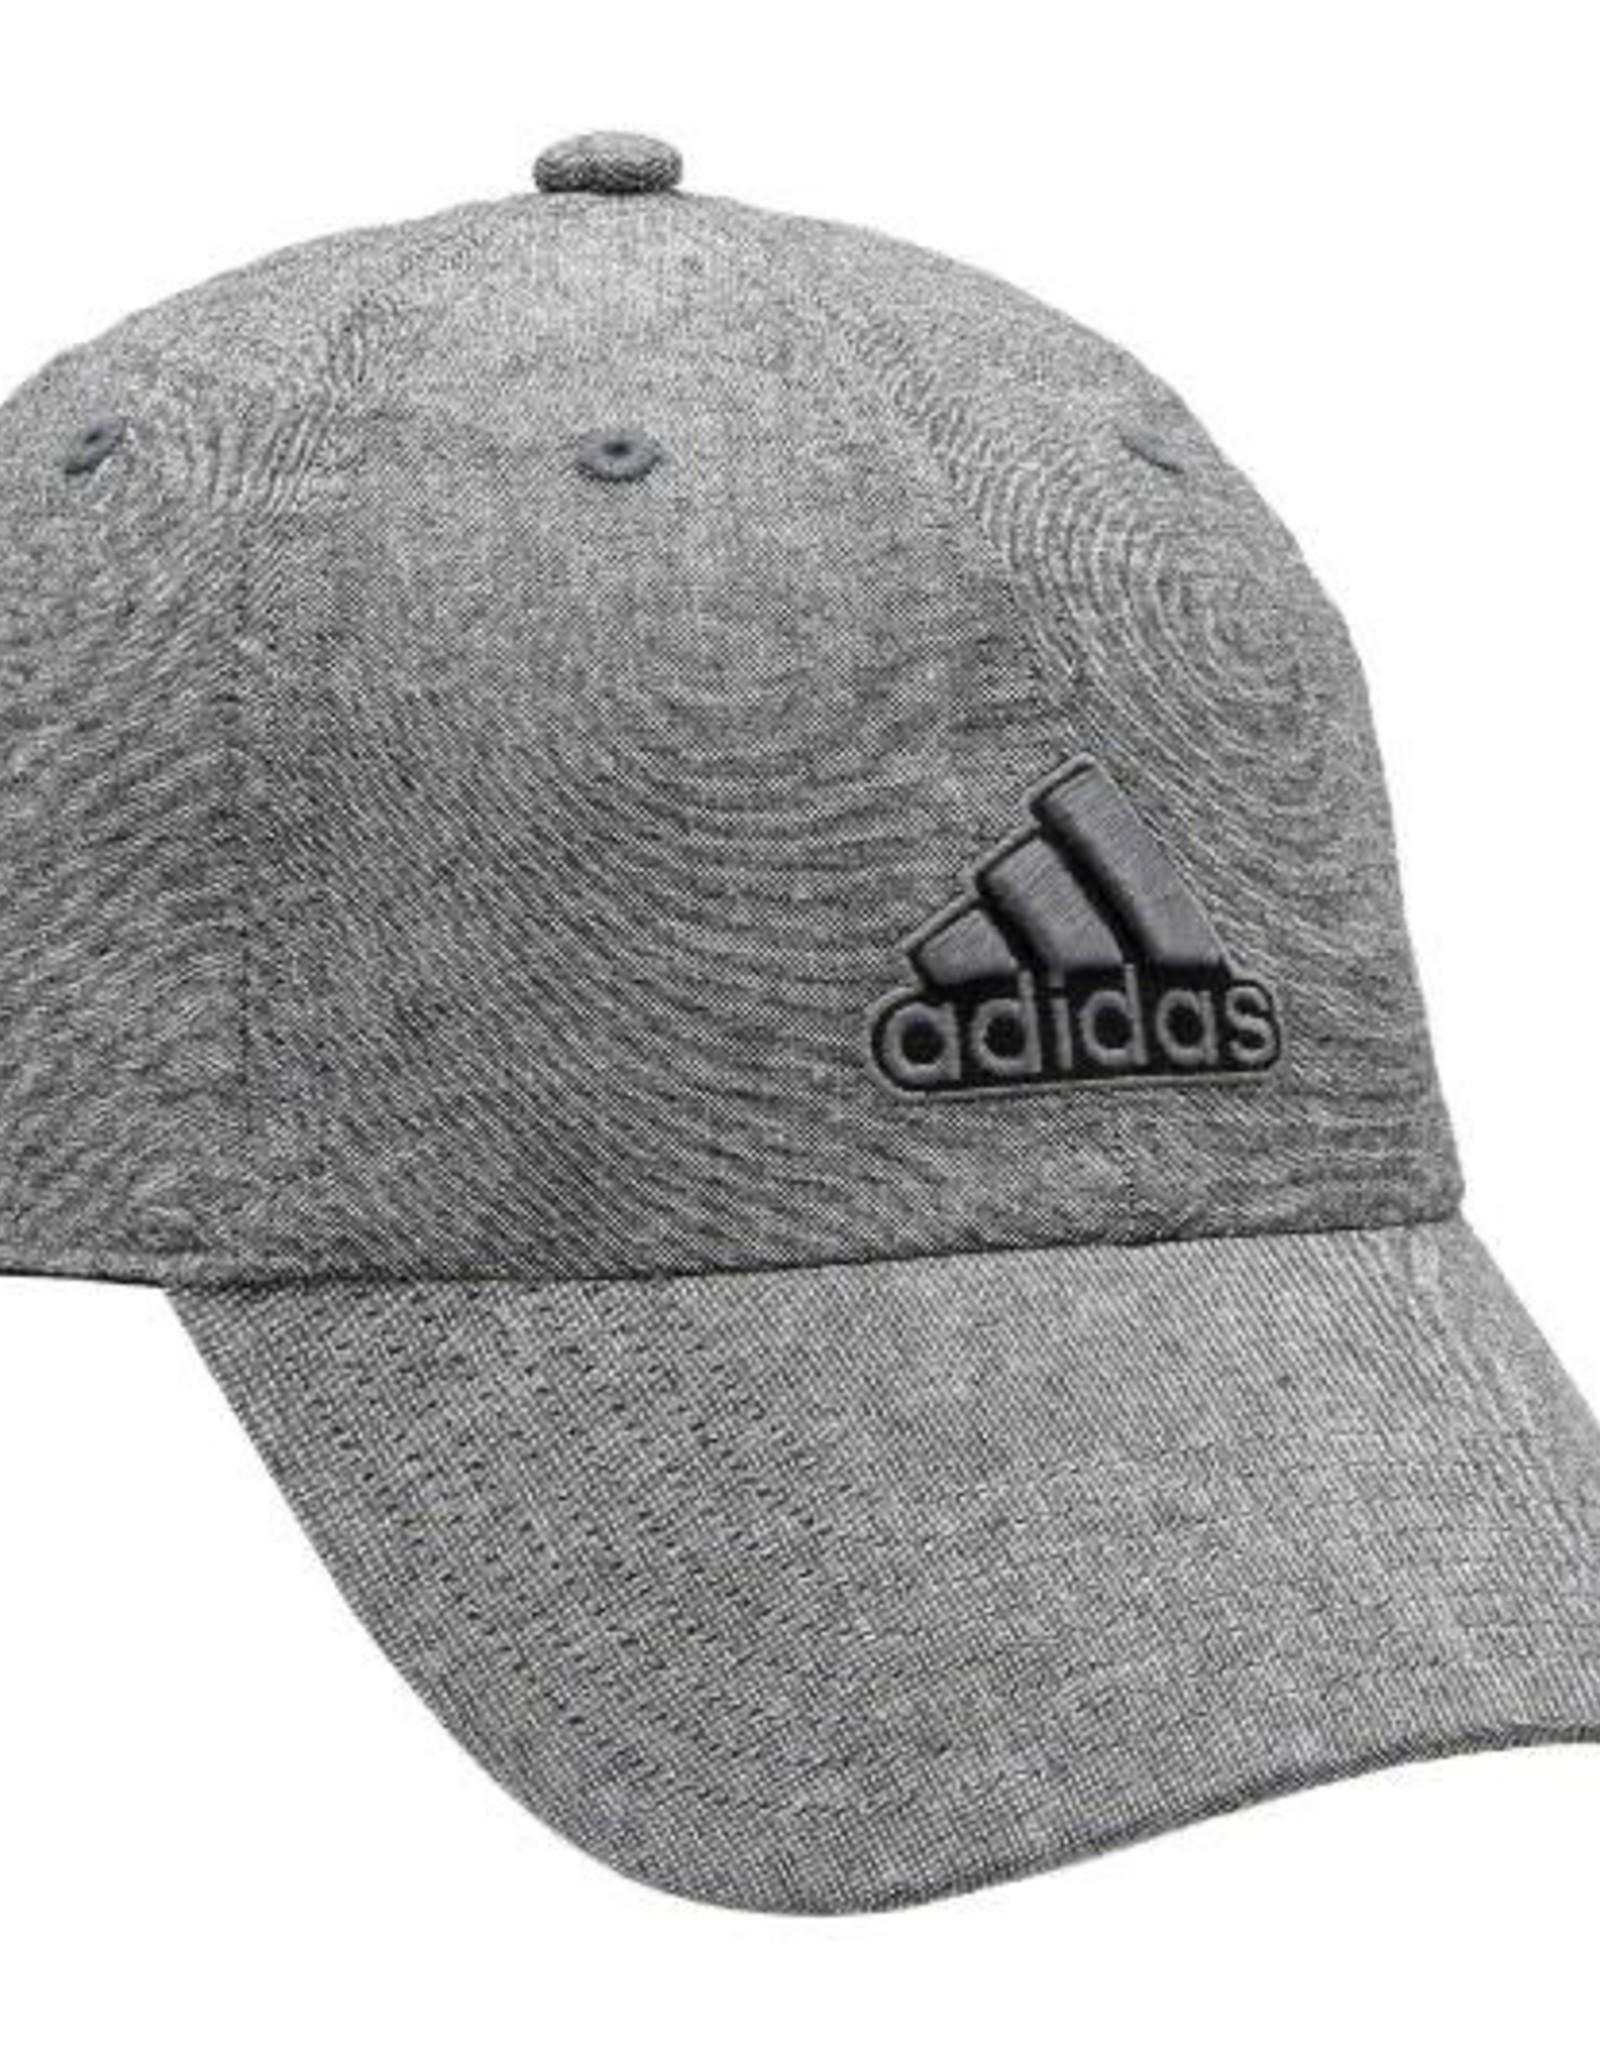 Adidas Adidas Ultimate Cap